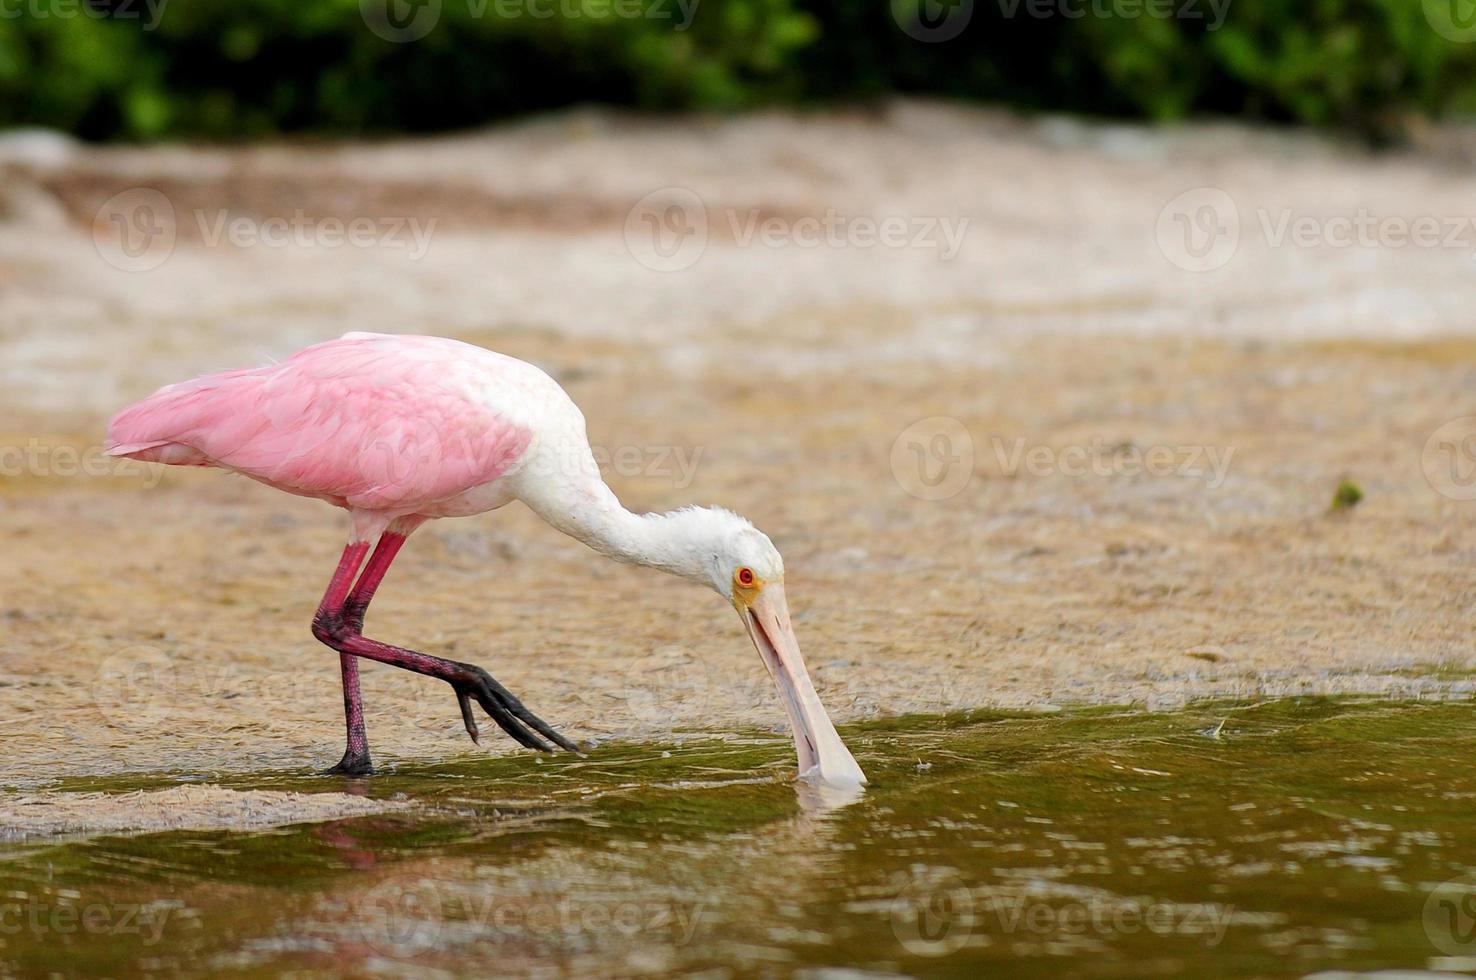 acqua potabile spatola rosata foto